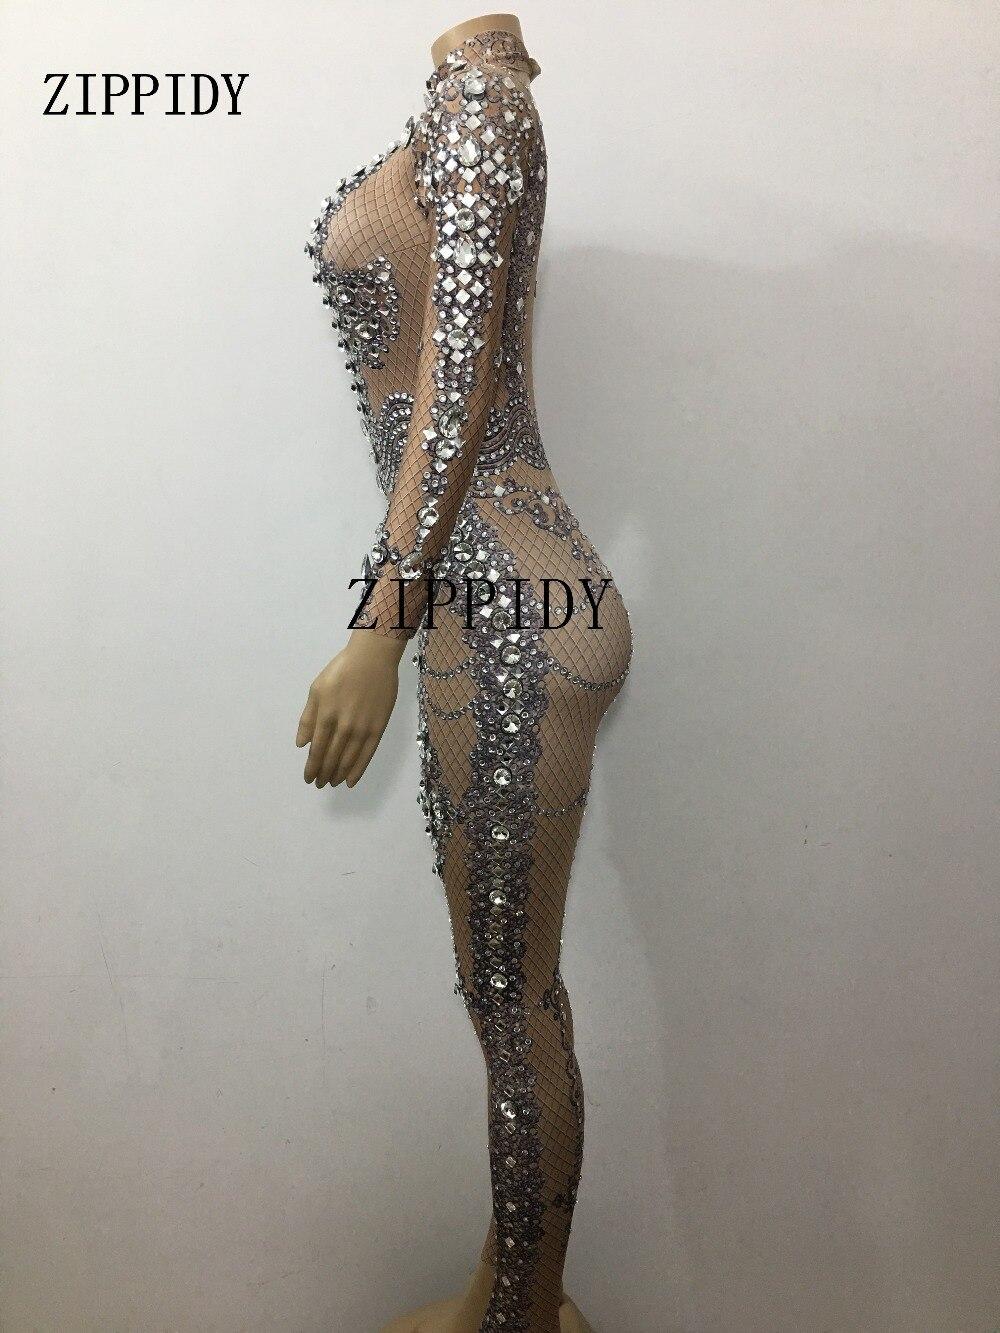 Cristaux Porter Brown Célébrer Performance De Body Femmes Grand Strass Salopette Sexy Stretch Costume Anniversaire Luxueux Scintillants gqgBwp